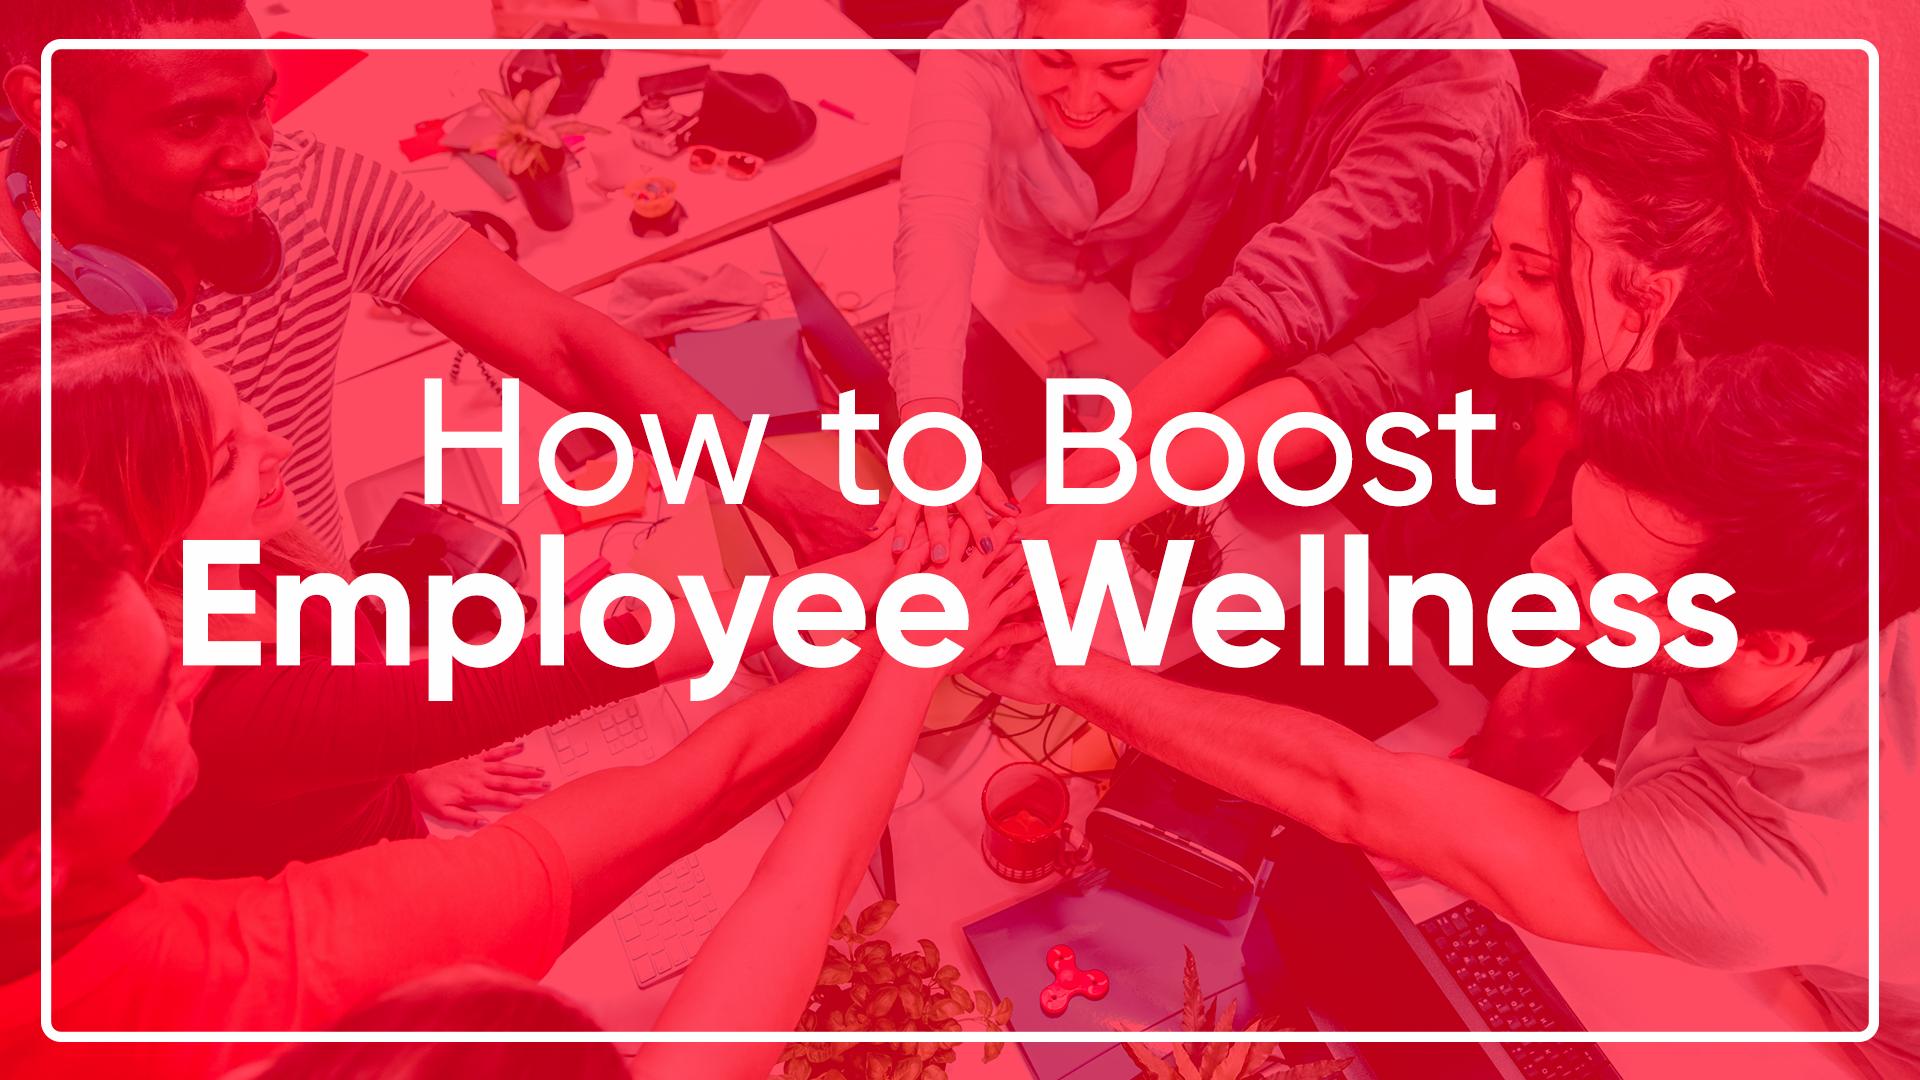 employee wellness, employee health, mental health, employee, employee tips, business tips, mental health 2021, wellness, employees, employee mental health, health and wellness